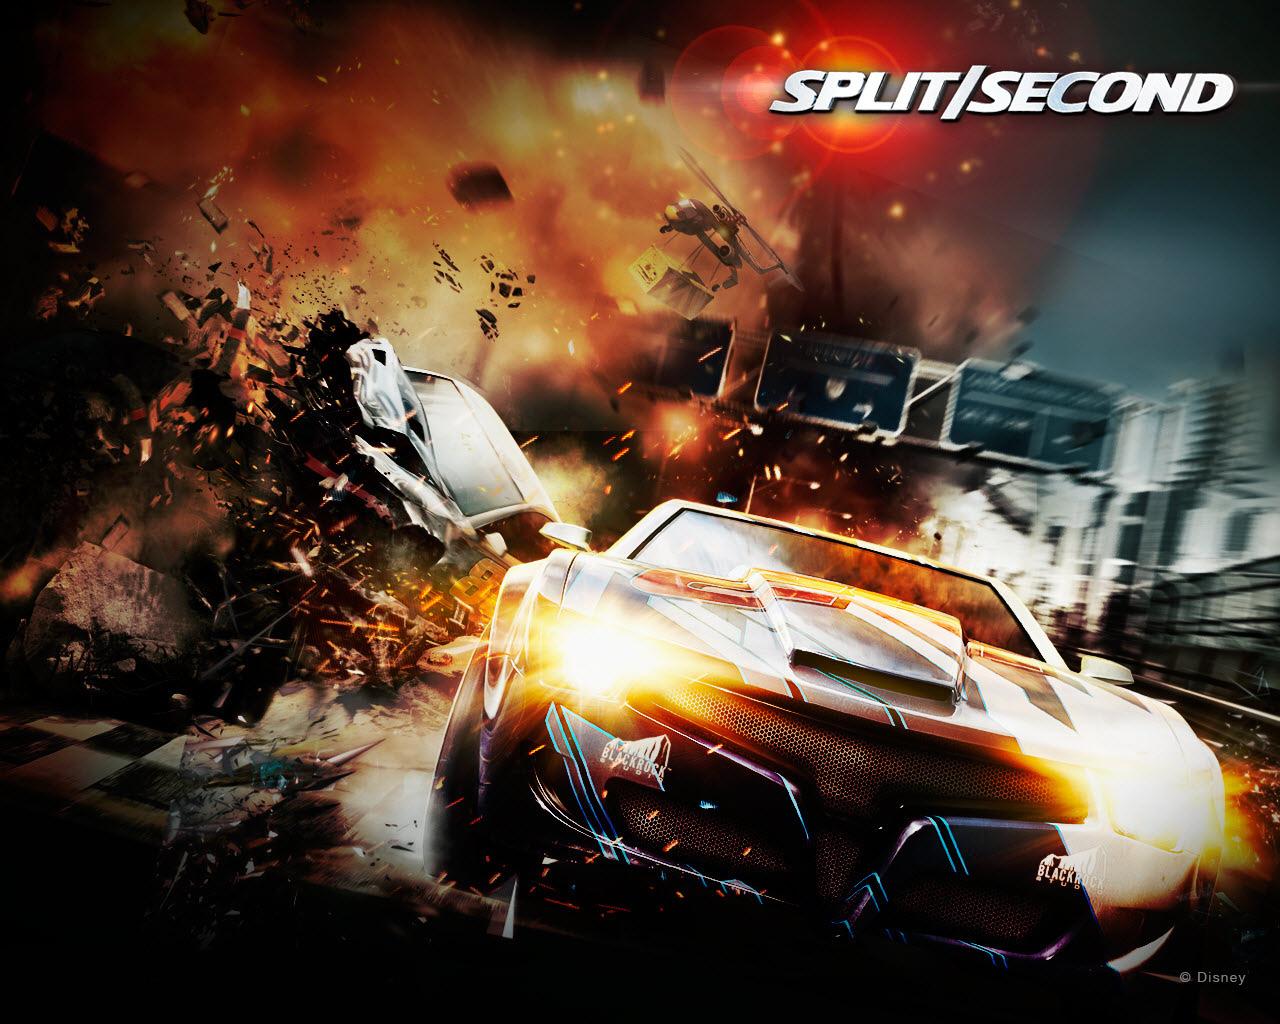 http://1.bp.blogspot.com/-0i5lbVtmLVk/T2mHKXUPzVI/AAAAAAAAA9Q/4-DaU35ZyOE/s1600/2010_spilt_second_racing_game-normal5.4.jpg